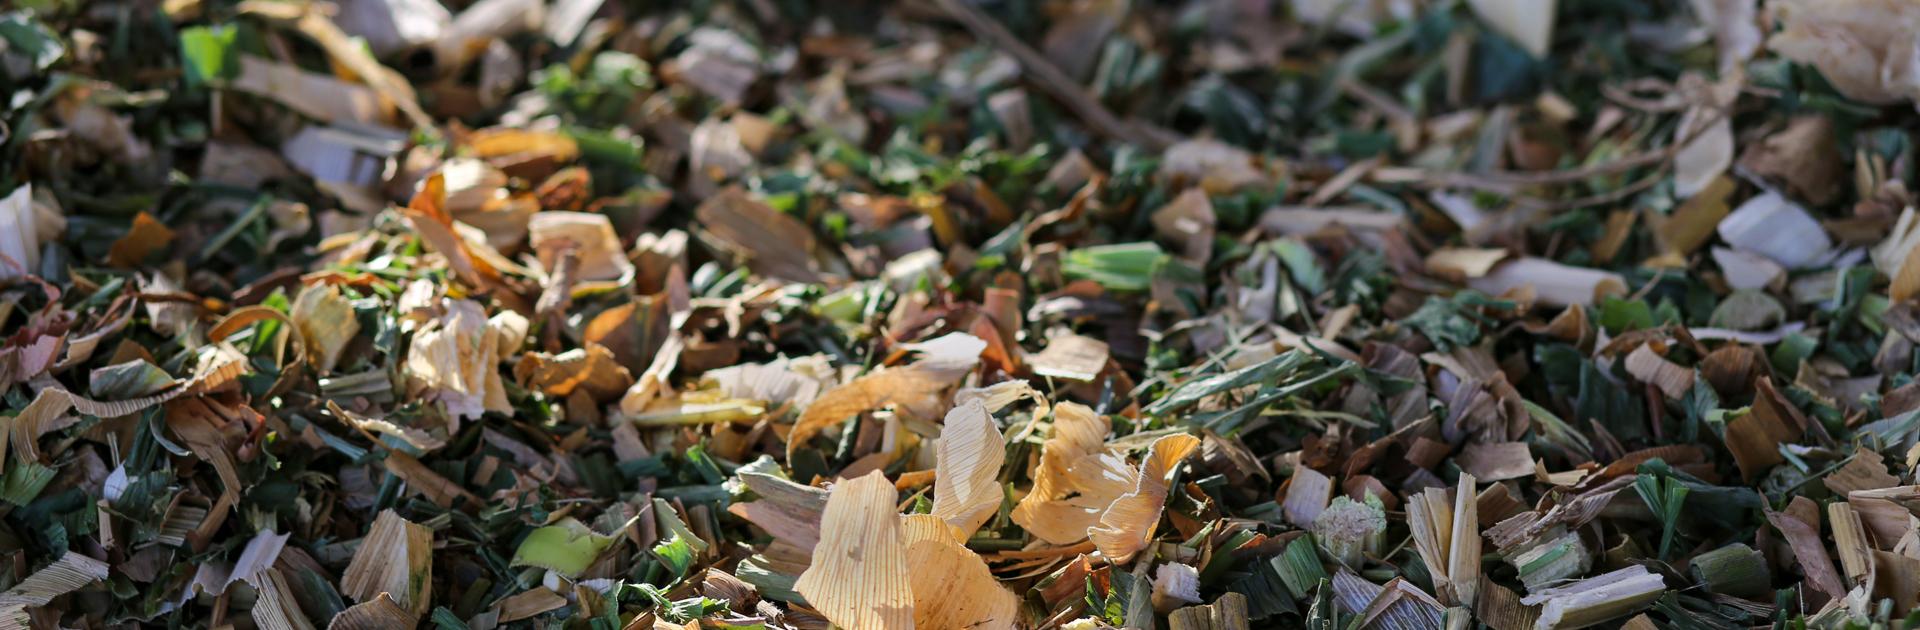 Naerenergi groent bioaffald giver groen biogas